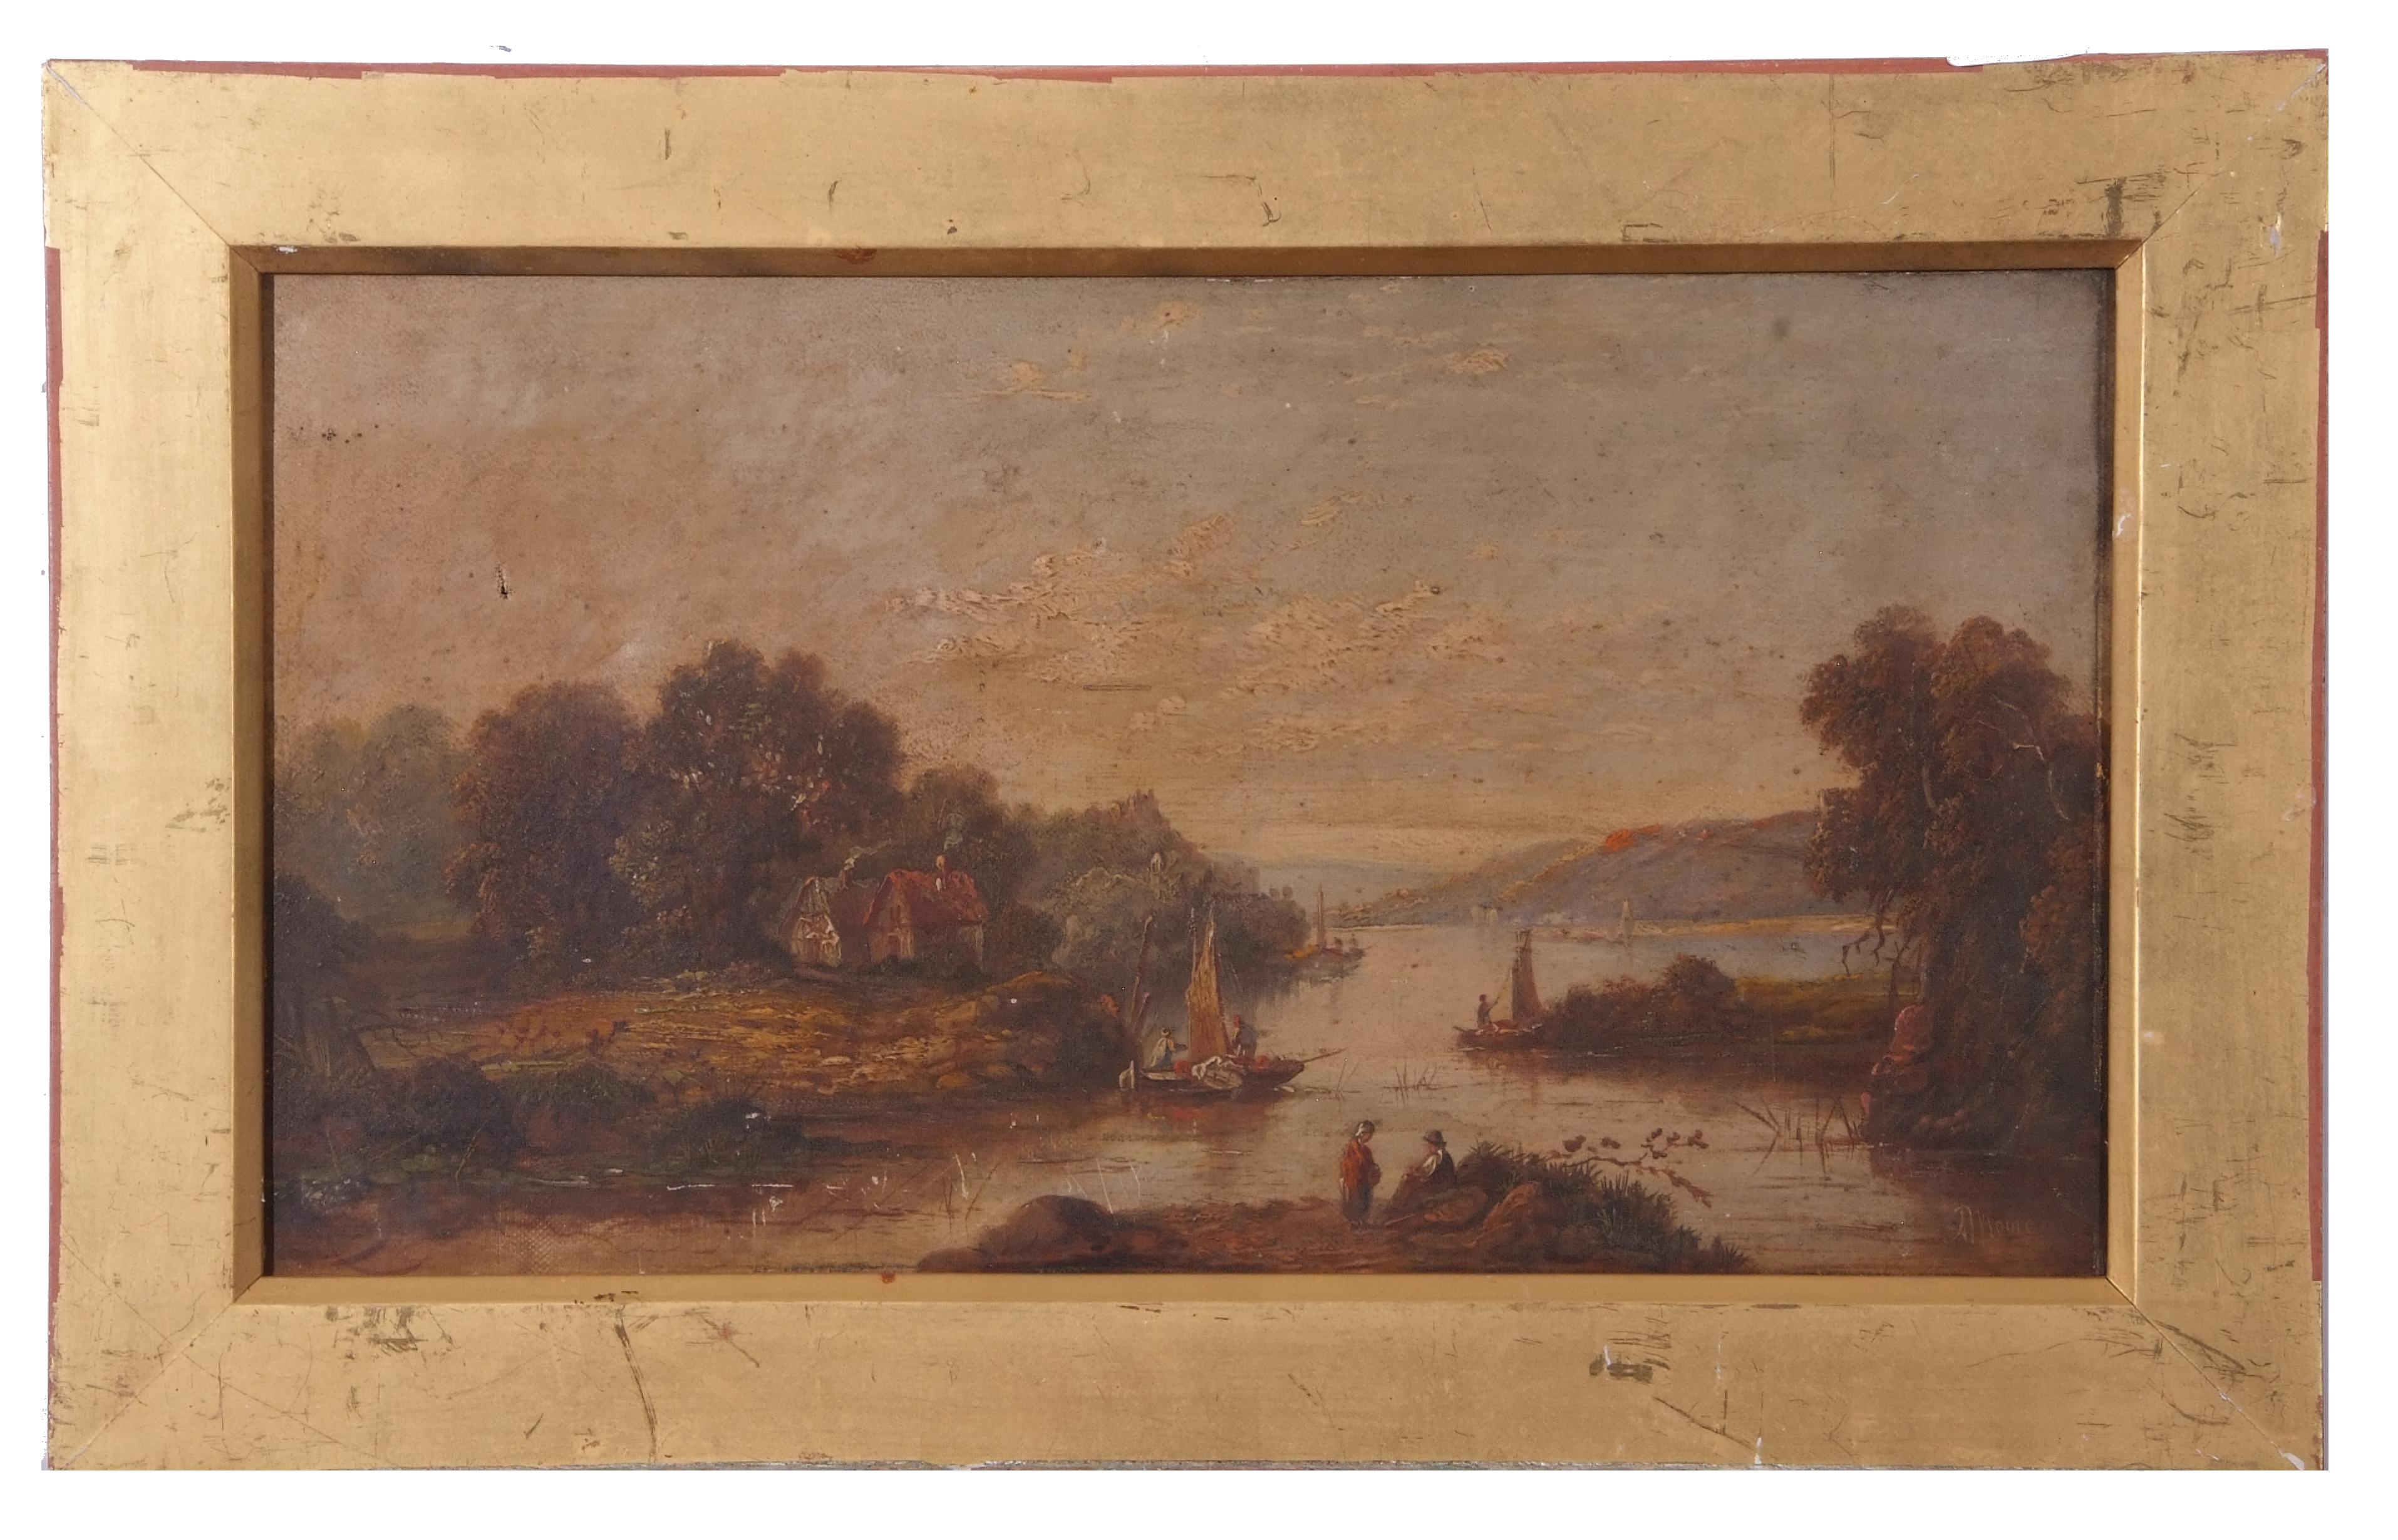 River Landscape, bearing signature J Moore, 24 x 44cm